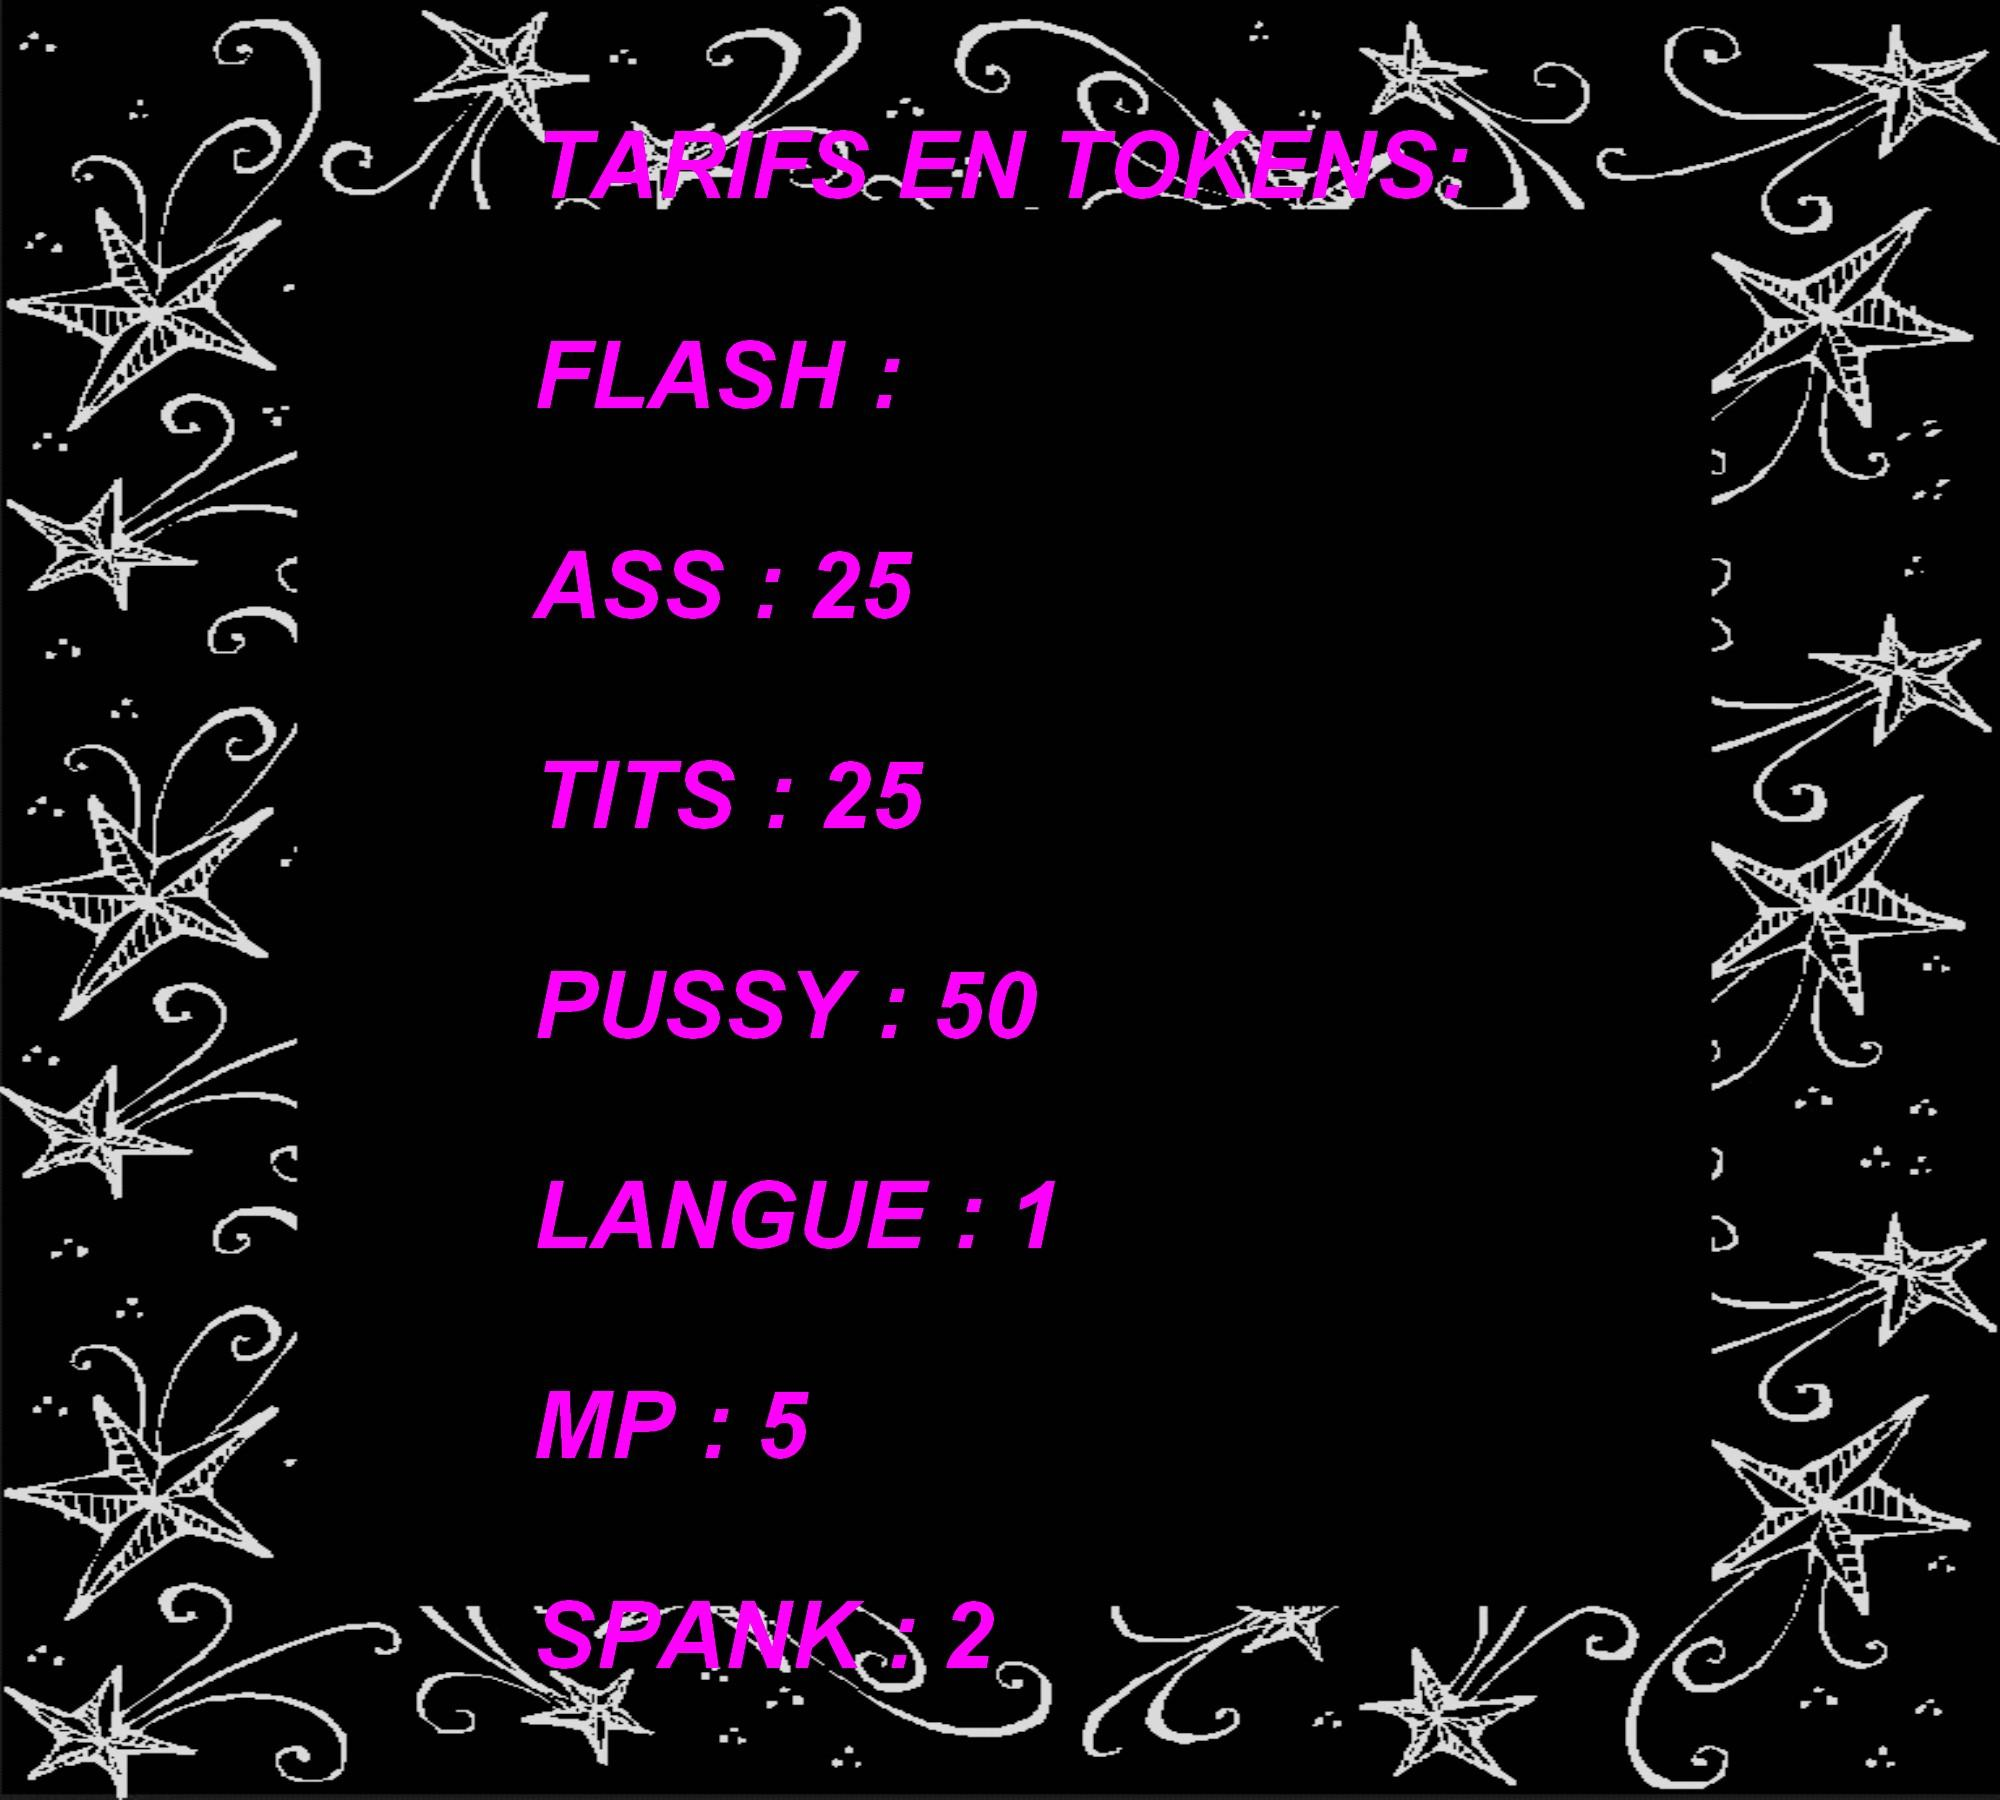 M8ndo16a5ilgeosbt7emknl43ga=